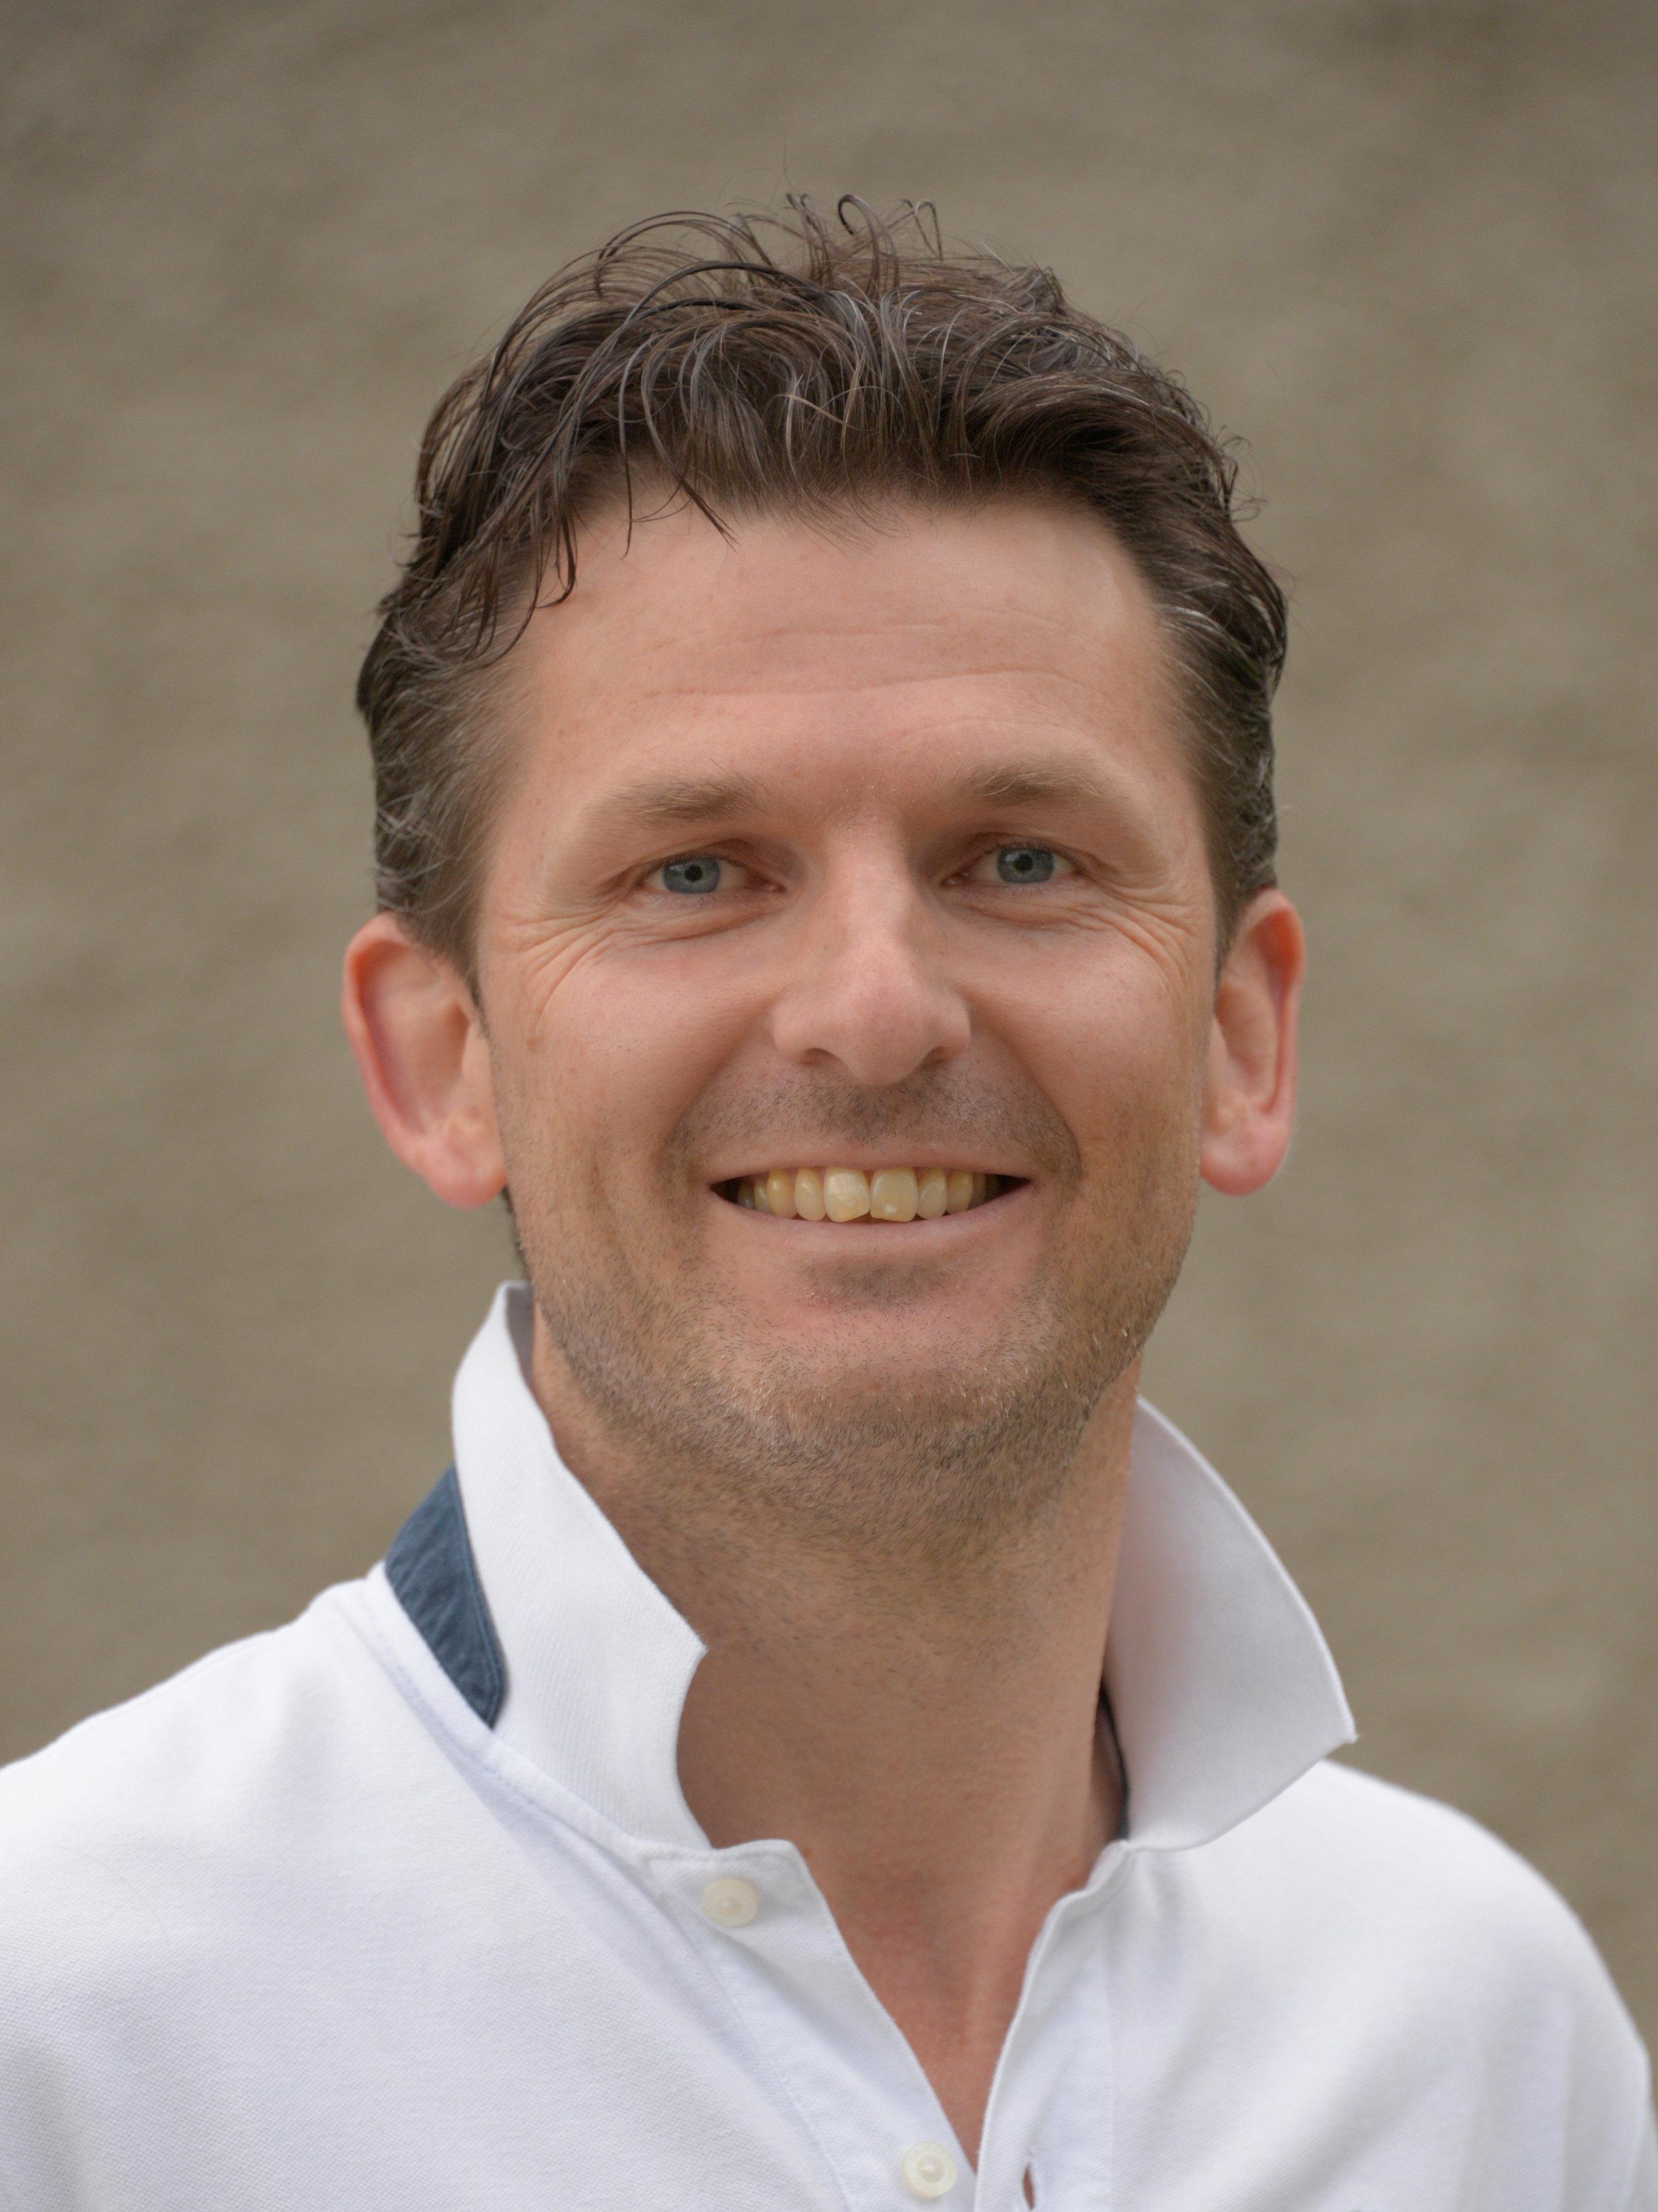 Stefan Kreutner